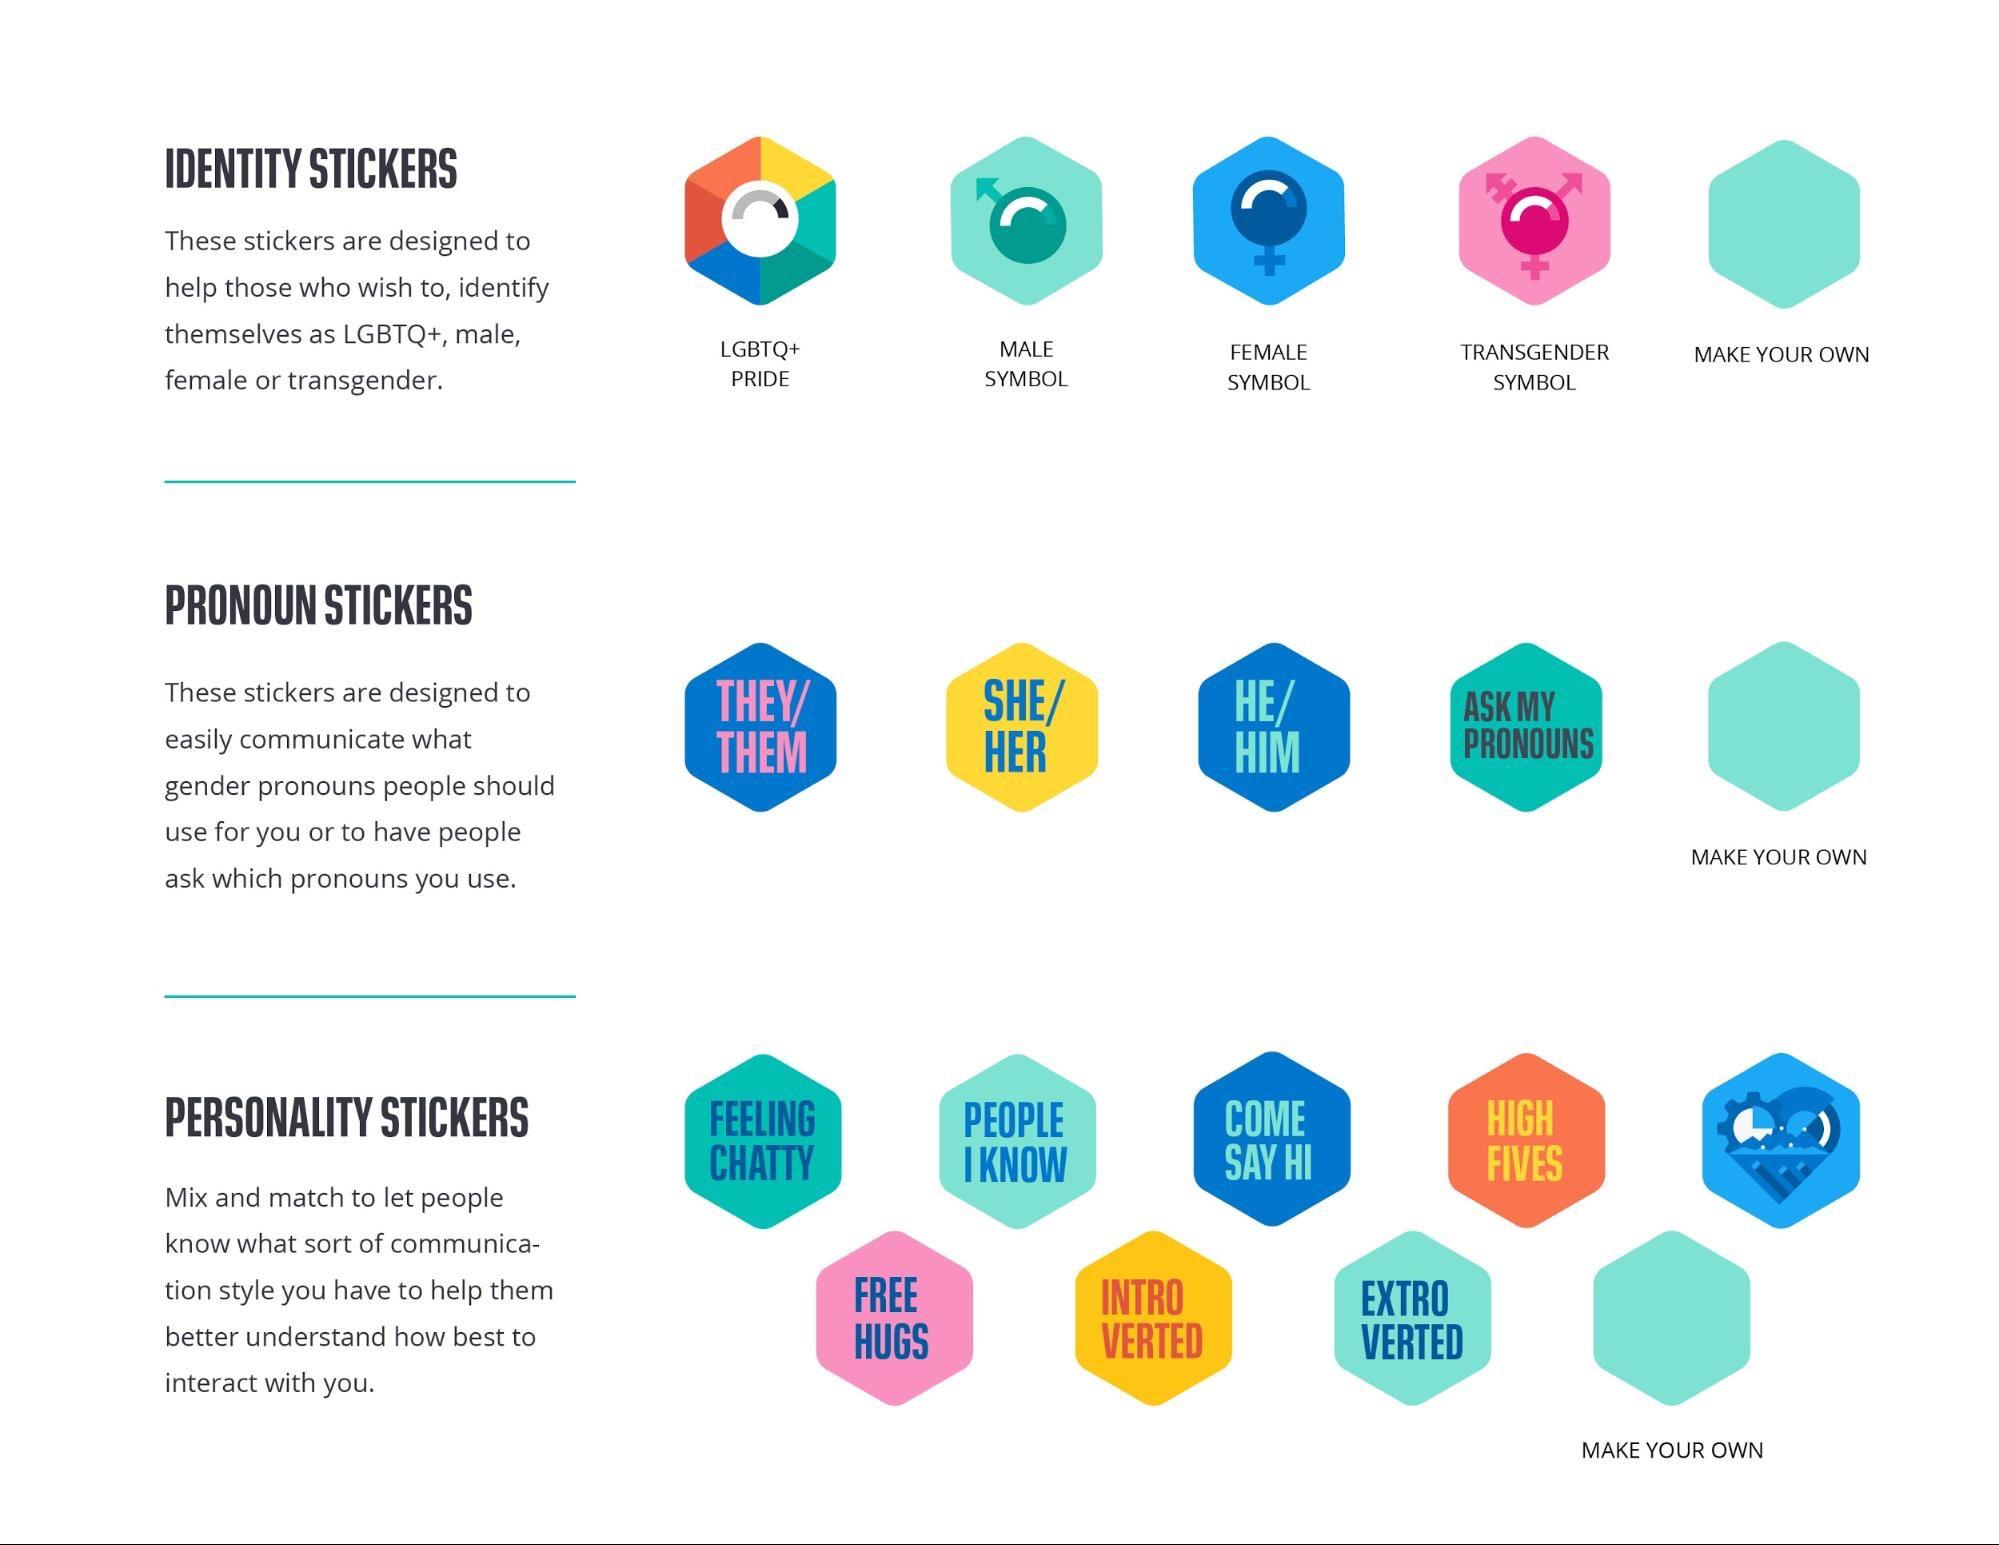 diversity_stickers.jpg